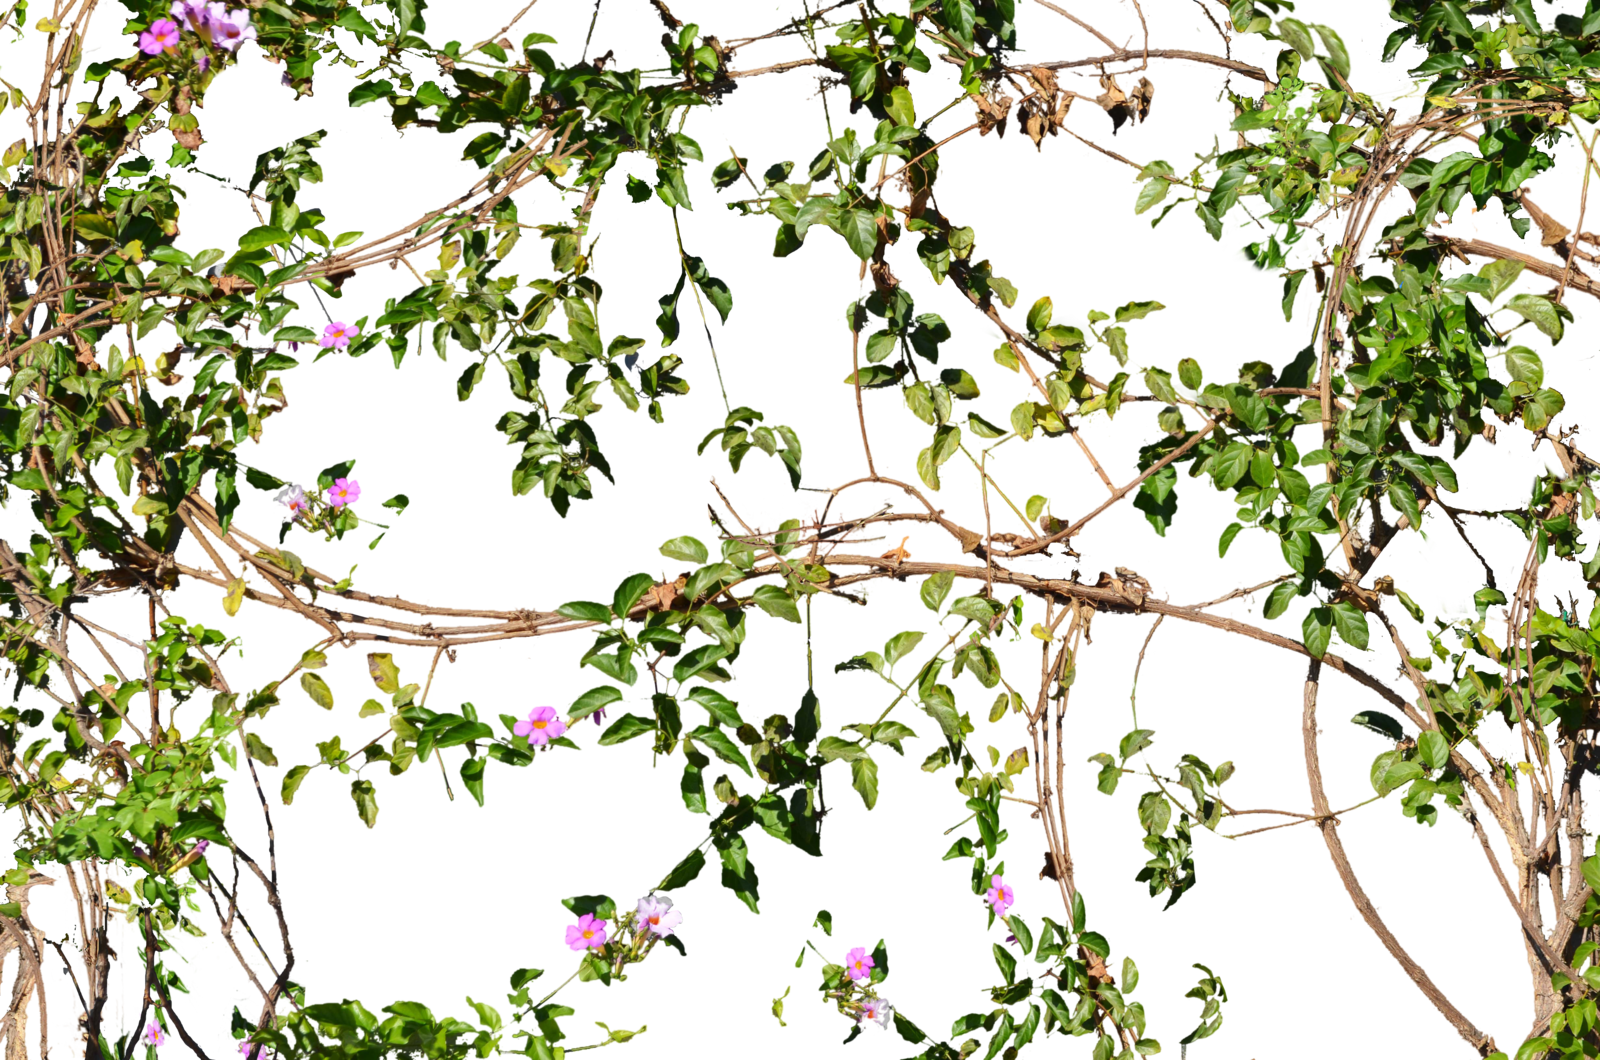 Vines transparent pictures free. Flower vine png